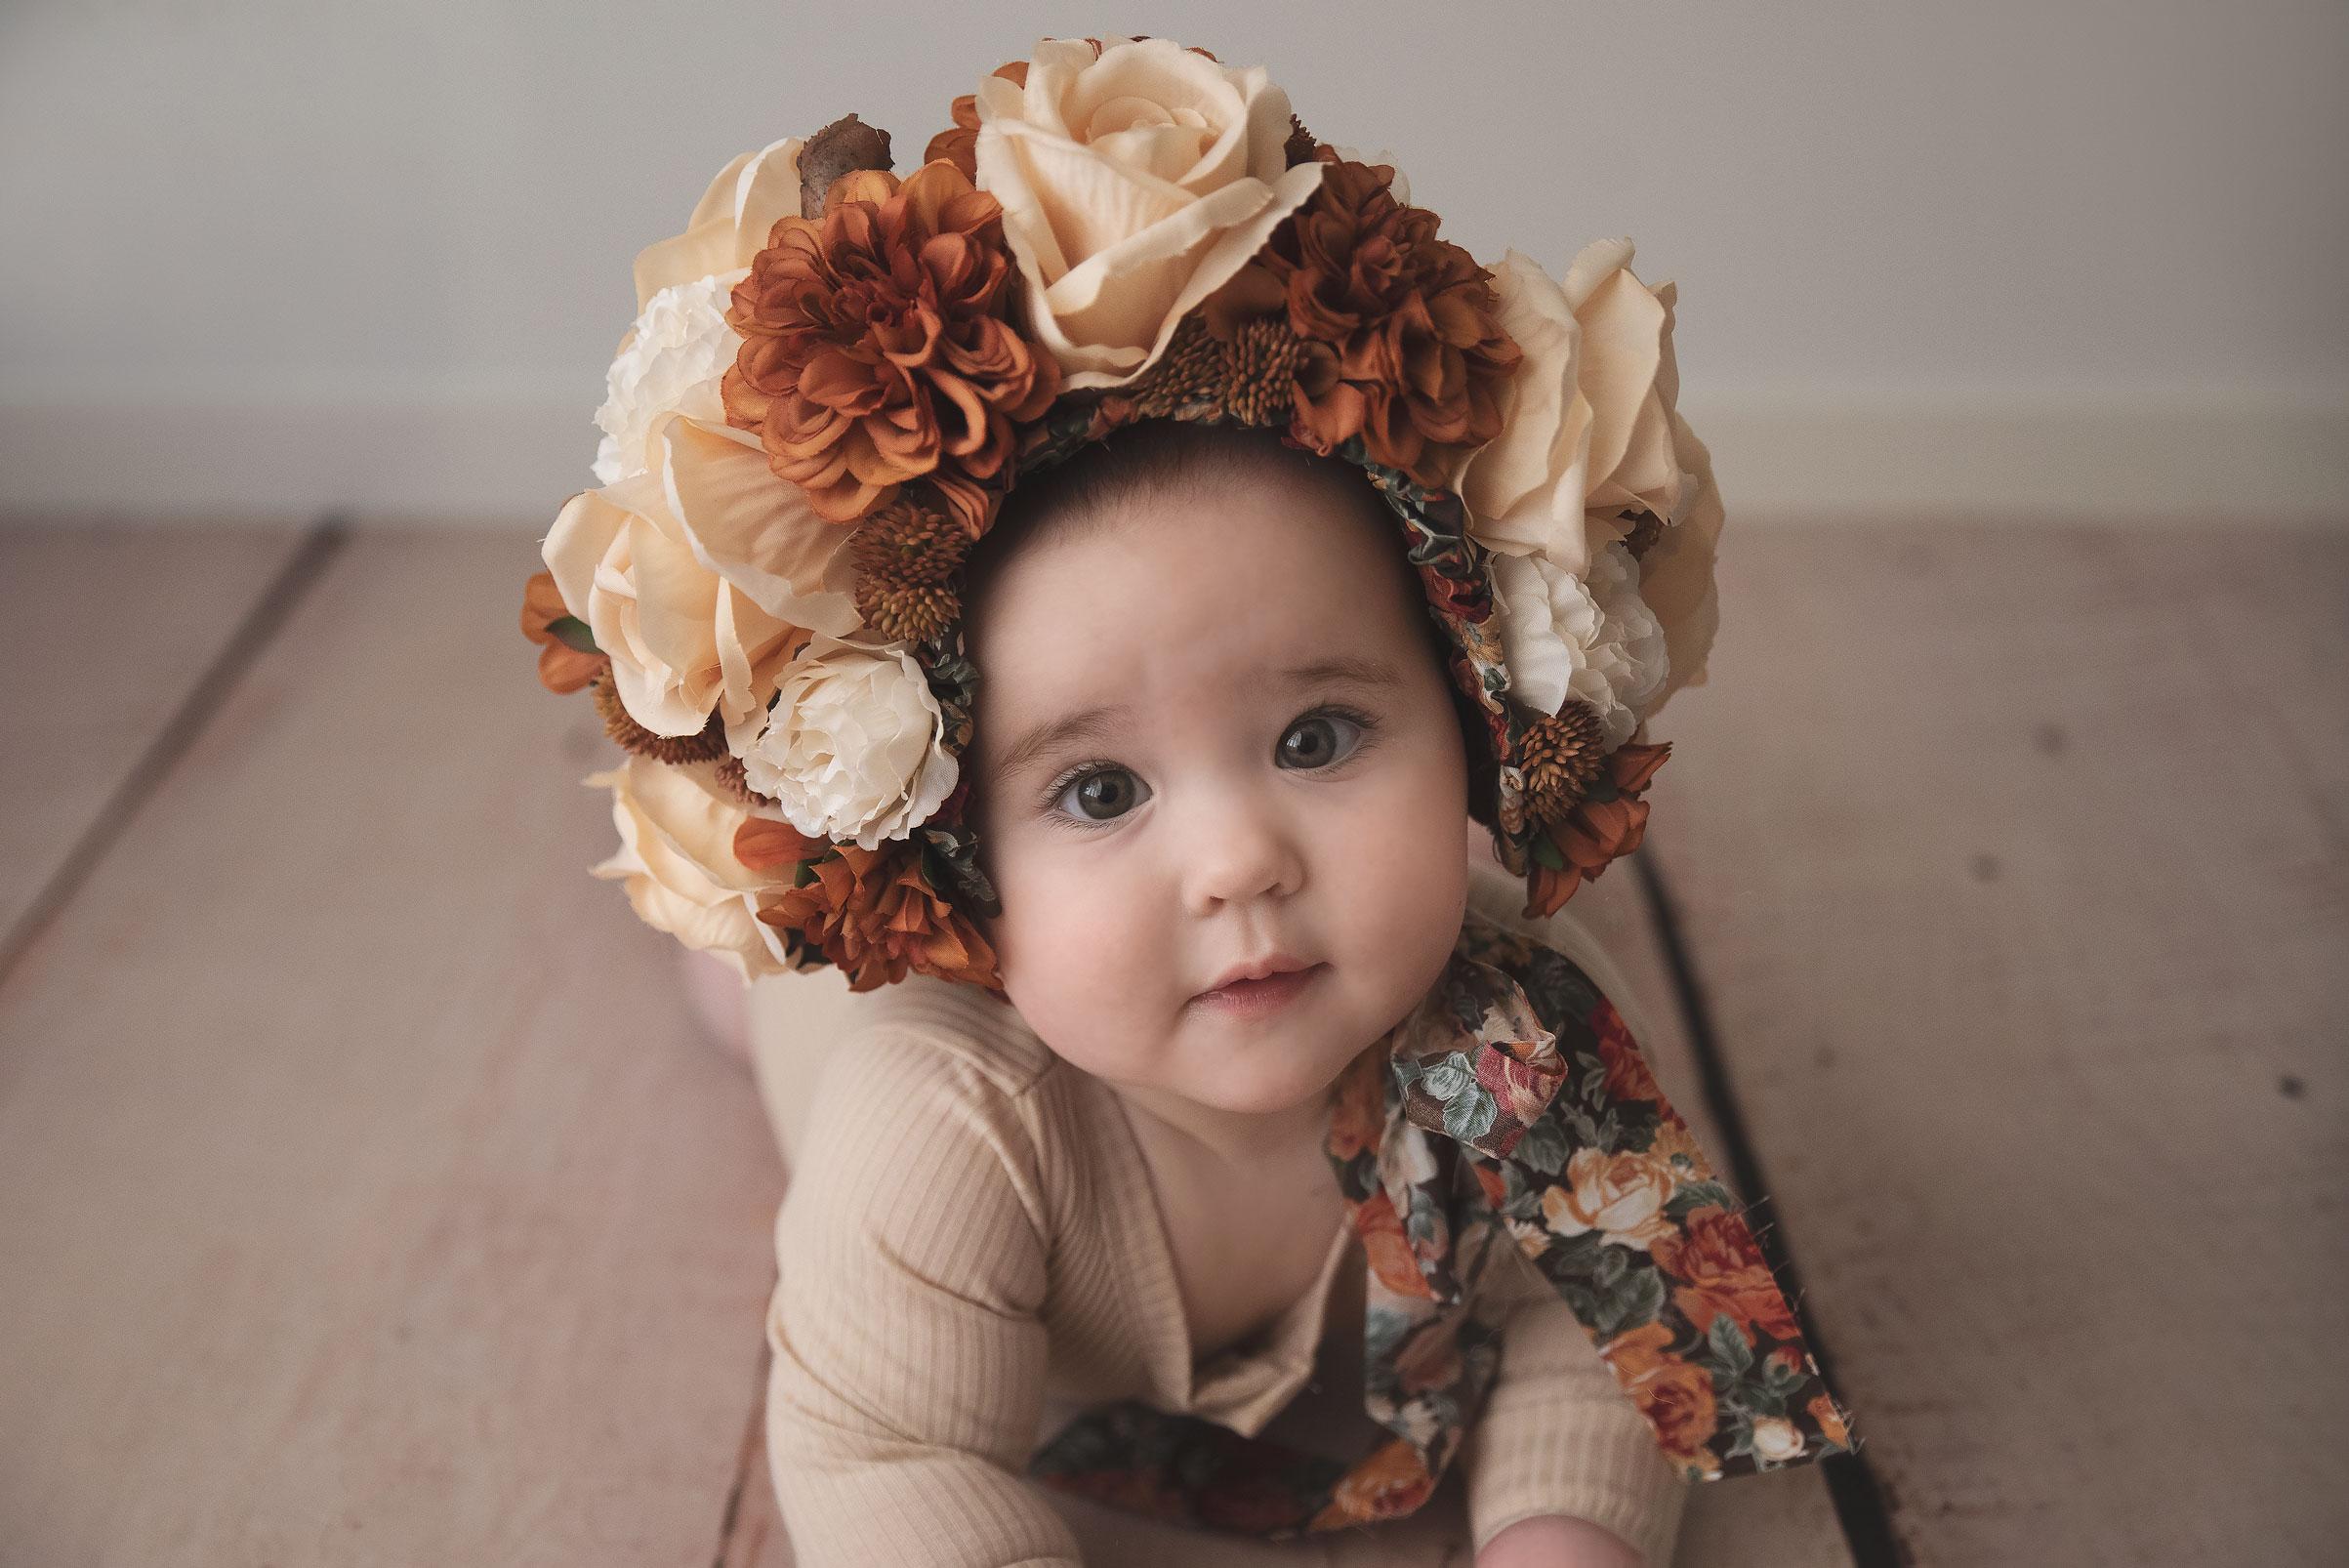 baby-photography-sydney-photo-shoot